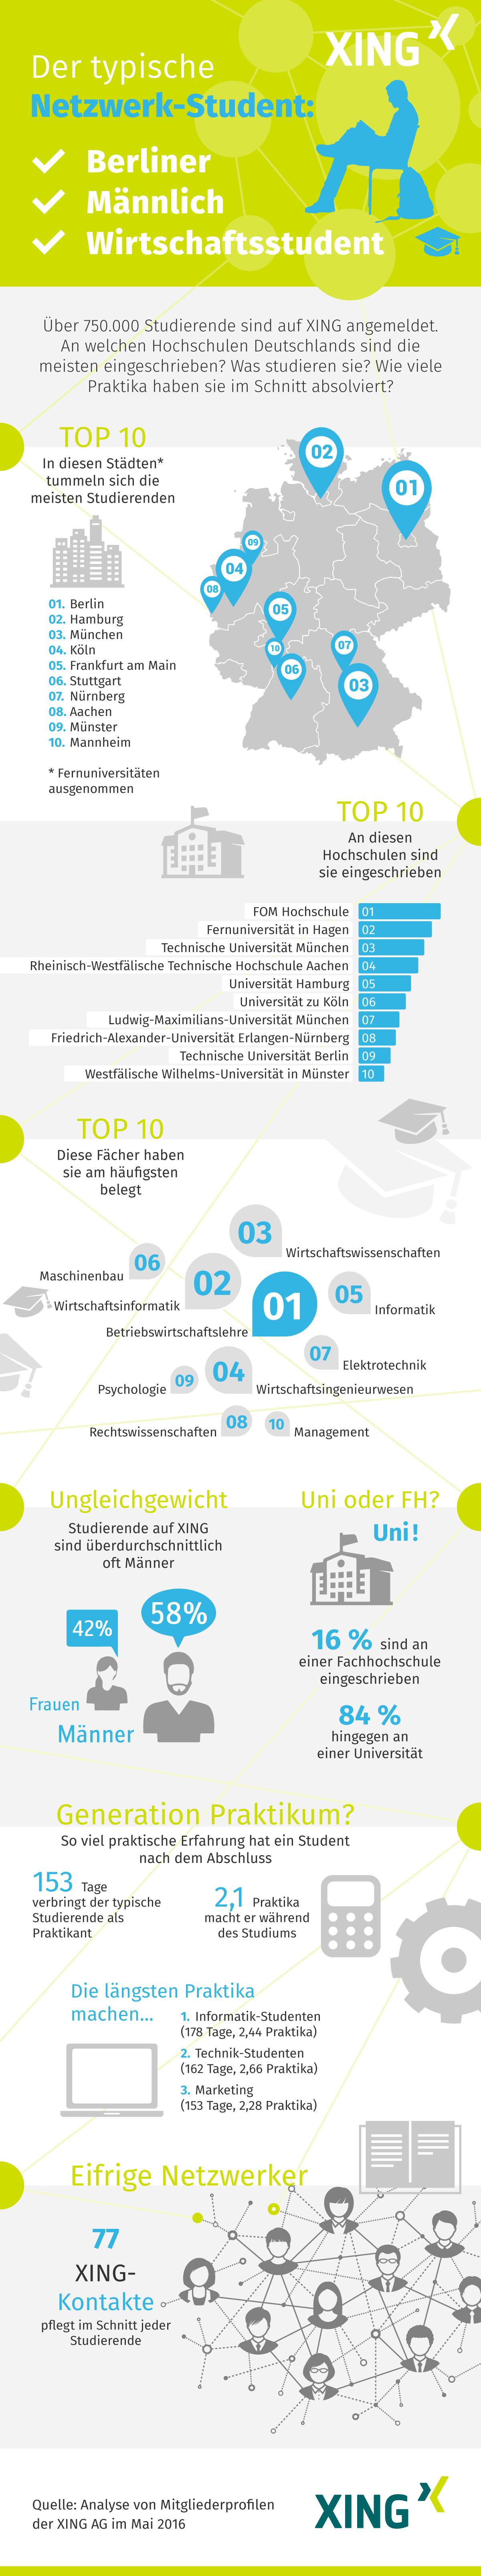 XING_Campus_Infografik